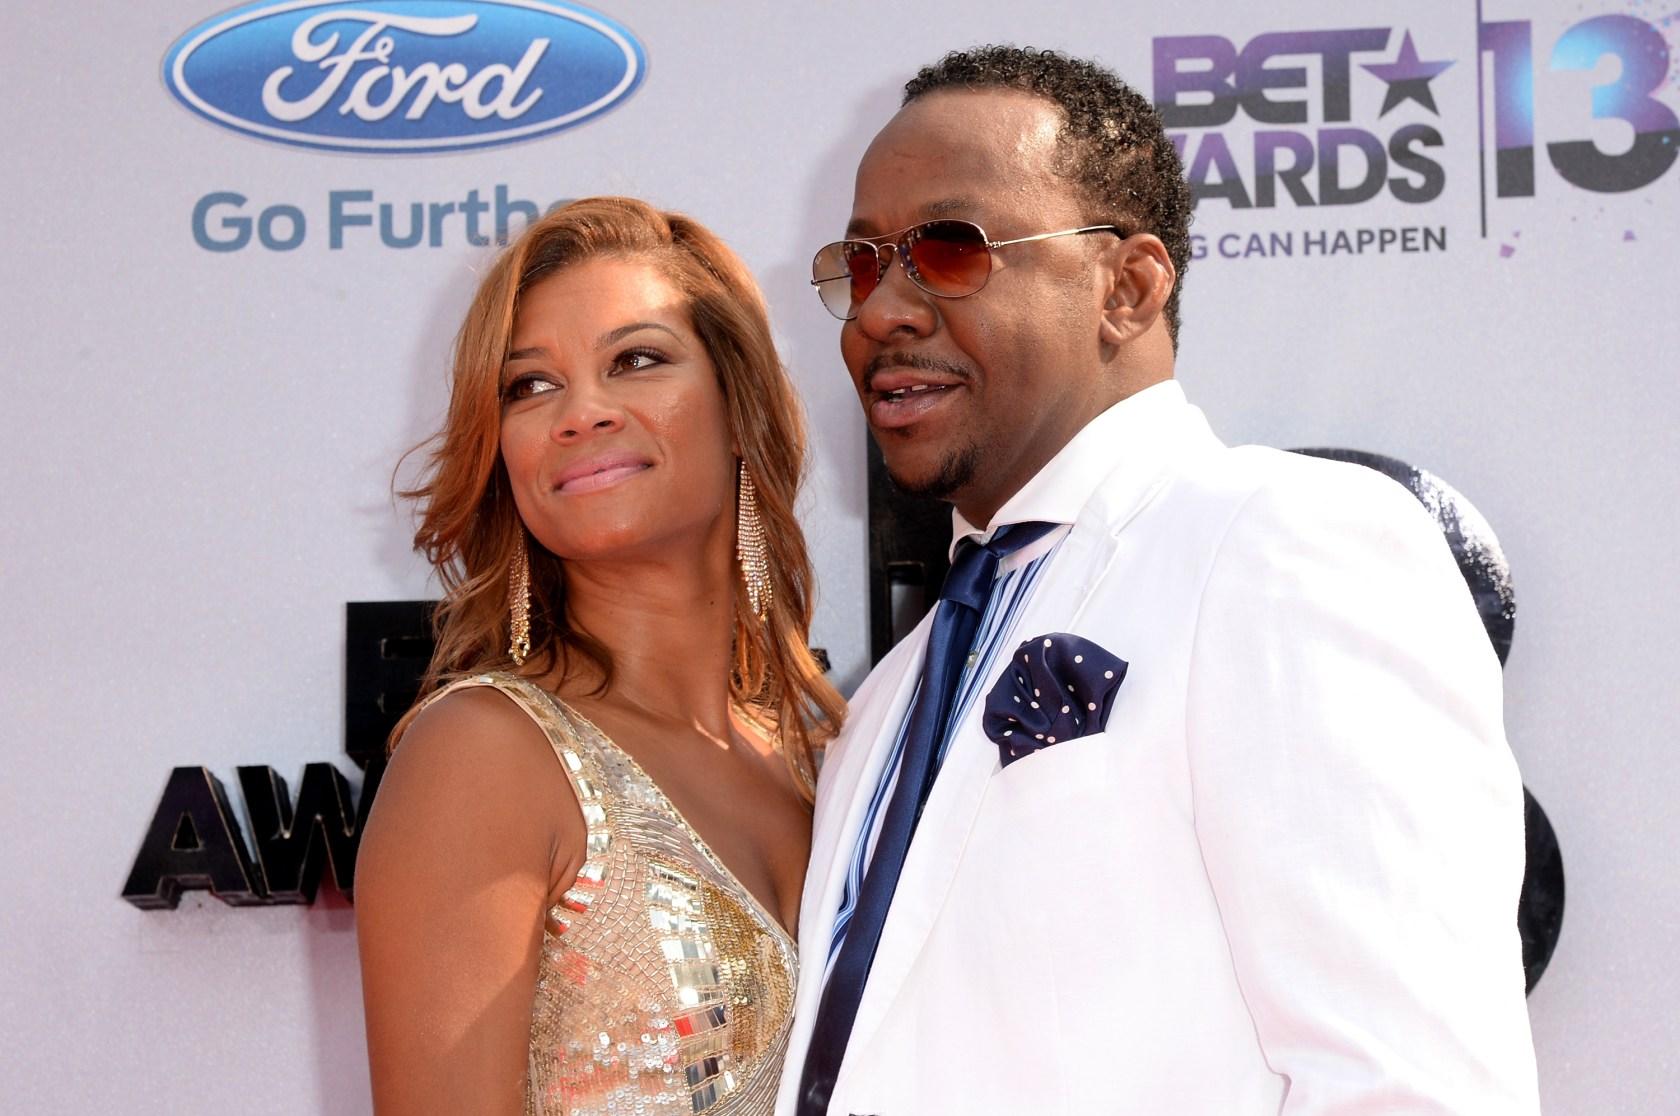 2013 BET Awards - Ford Red Carpet